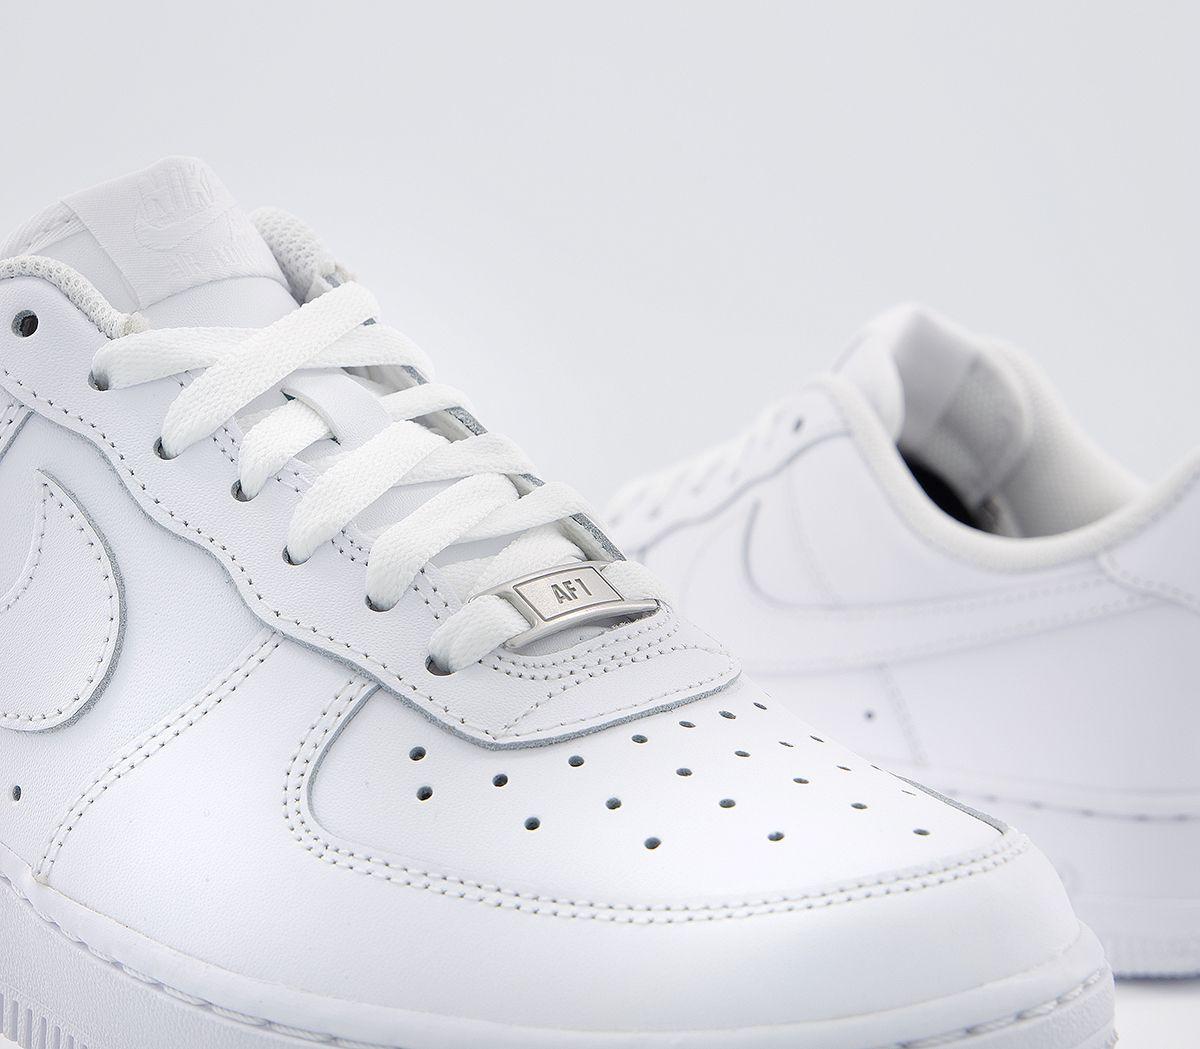 Nike Air Force 1 size 9 - £50 / £53.99 delivered @ Offspring